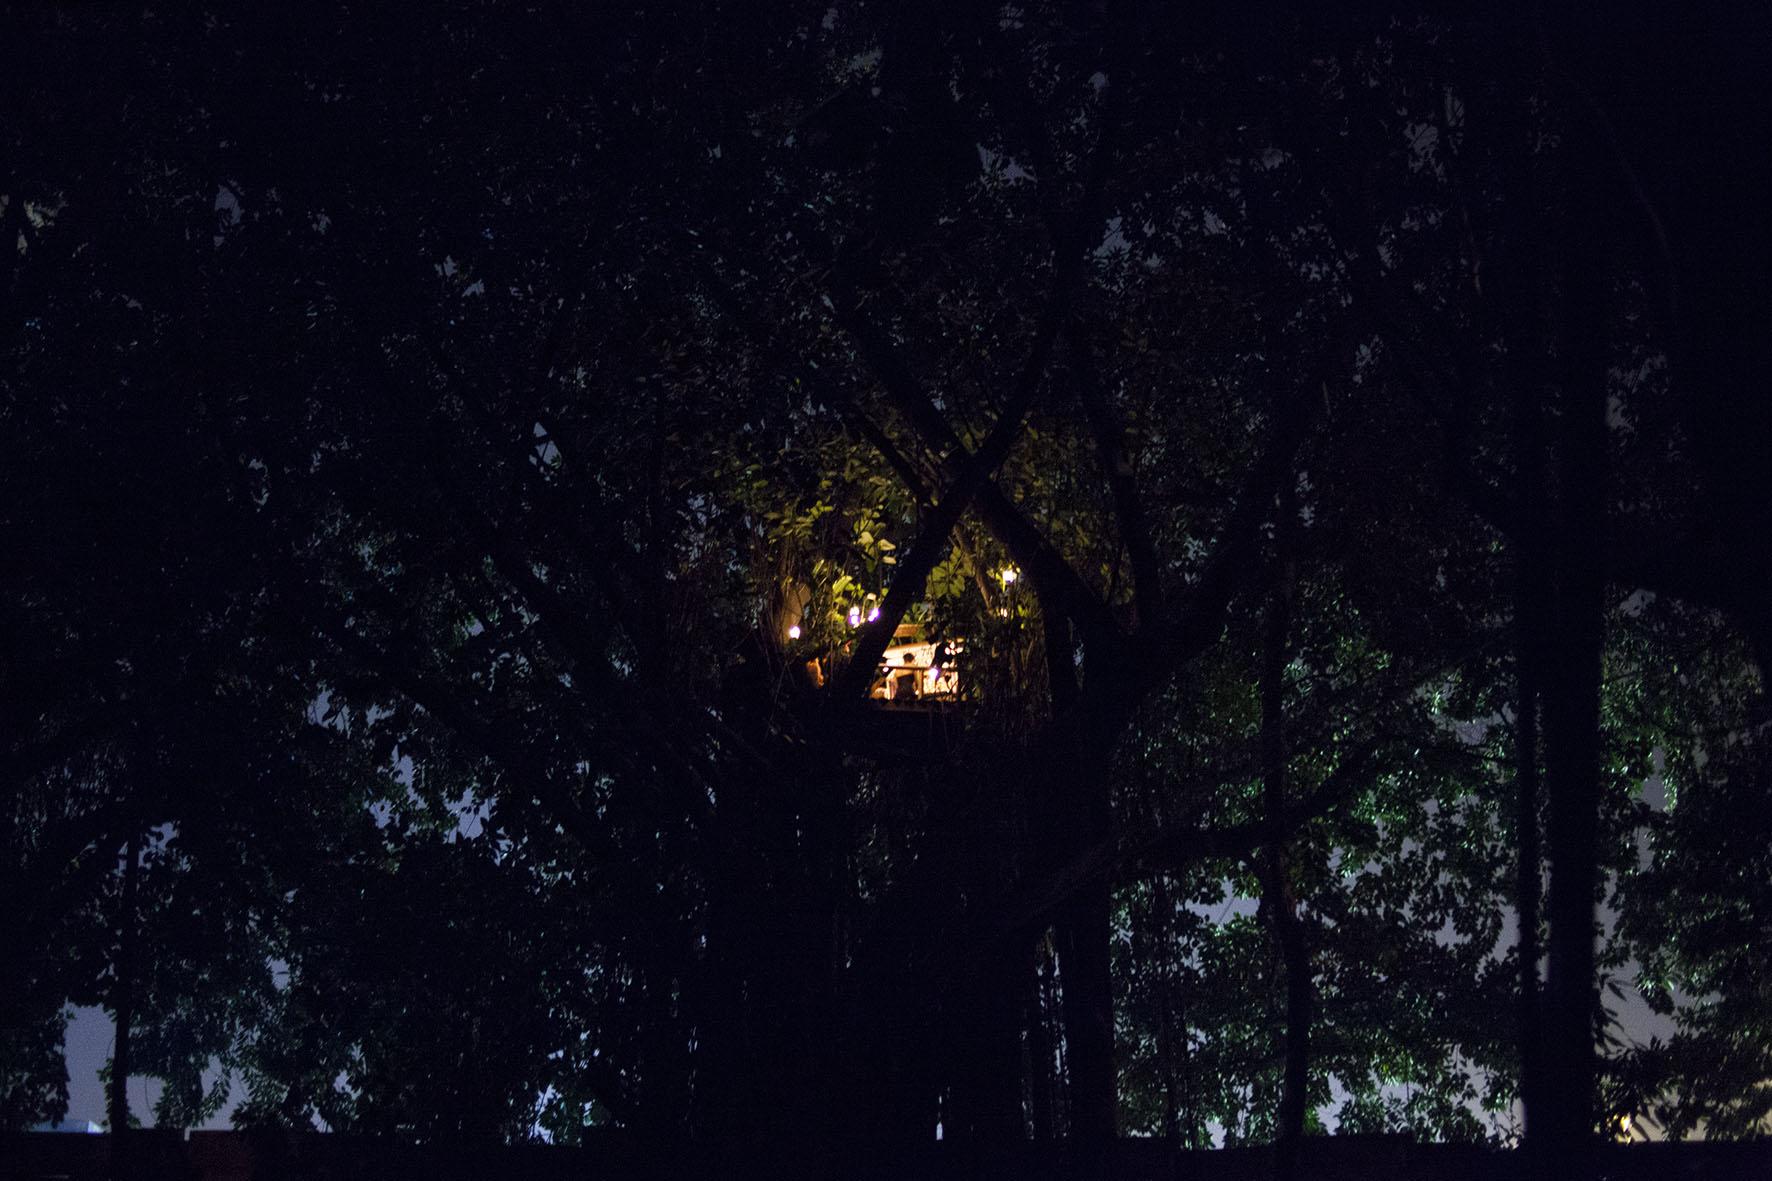 2.2the tree